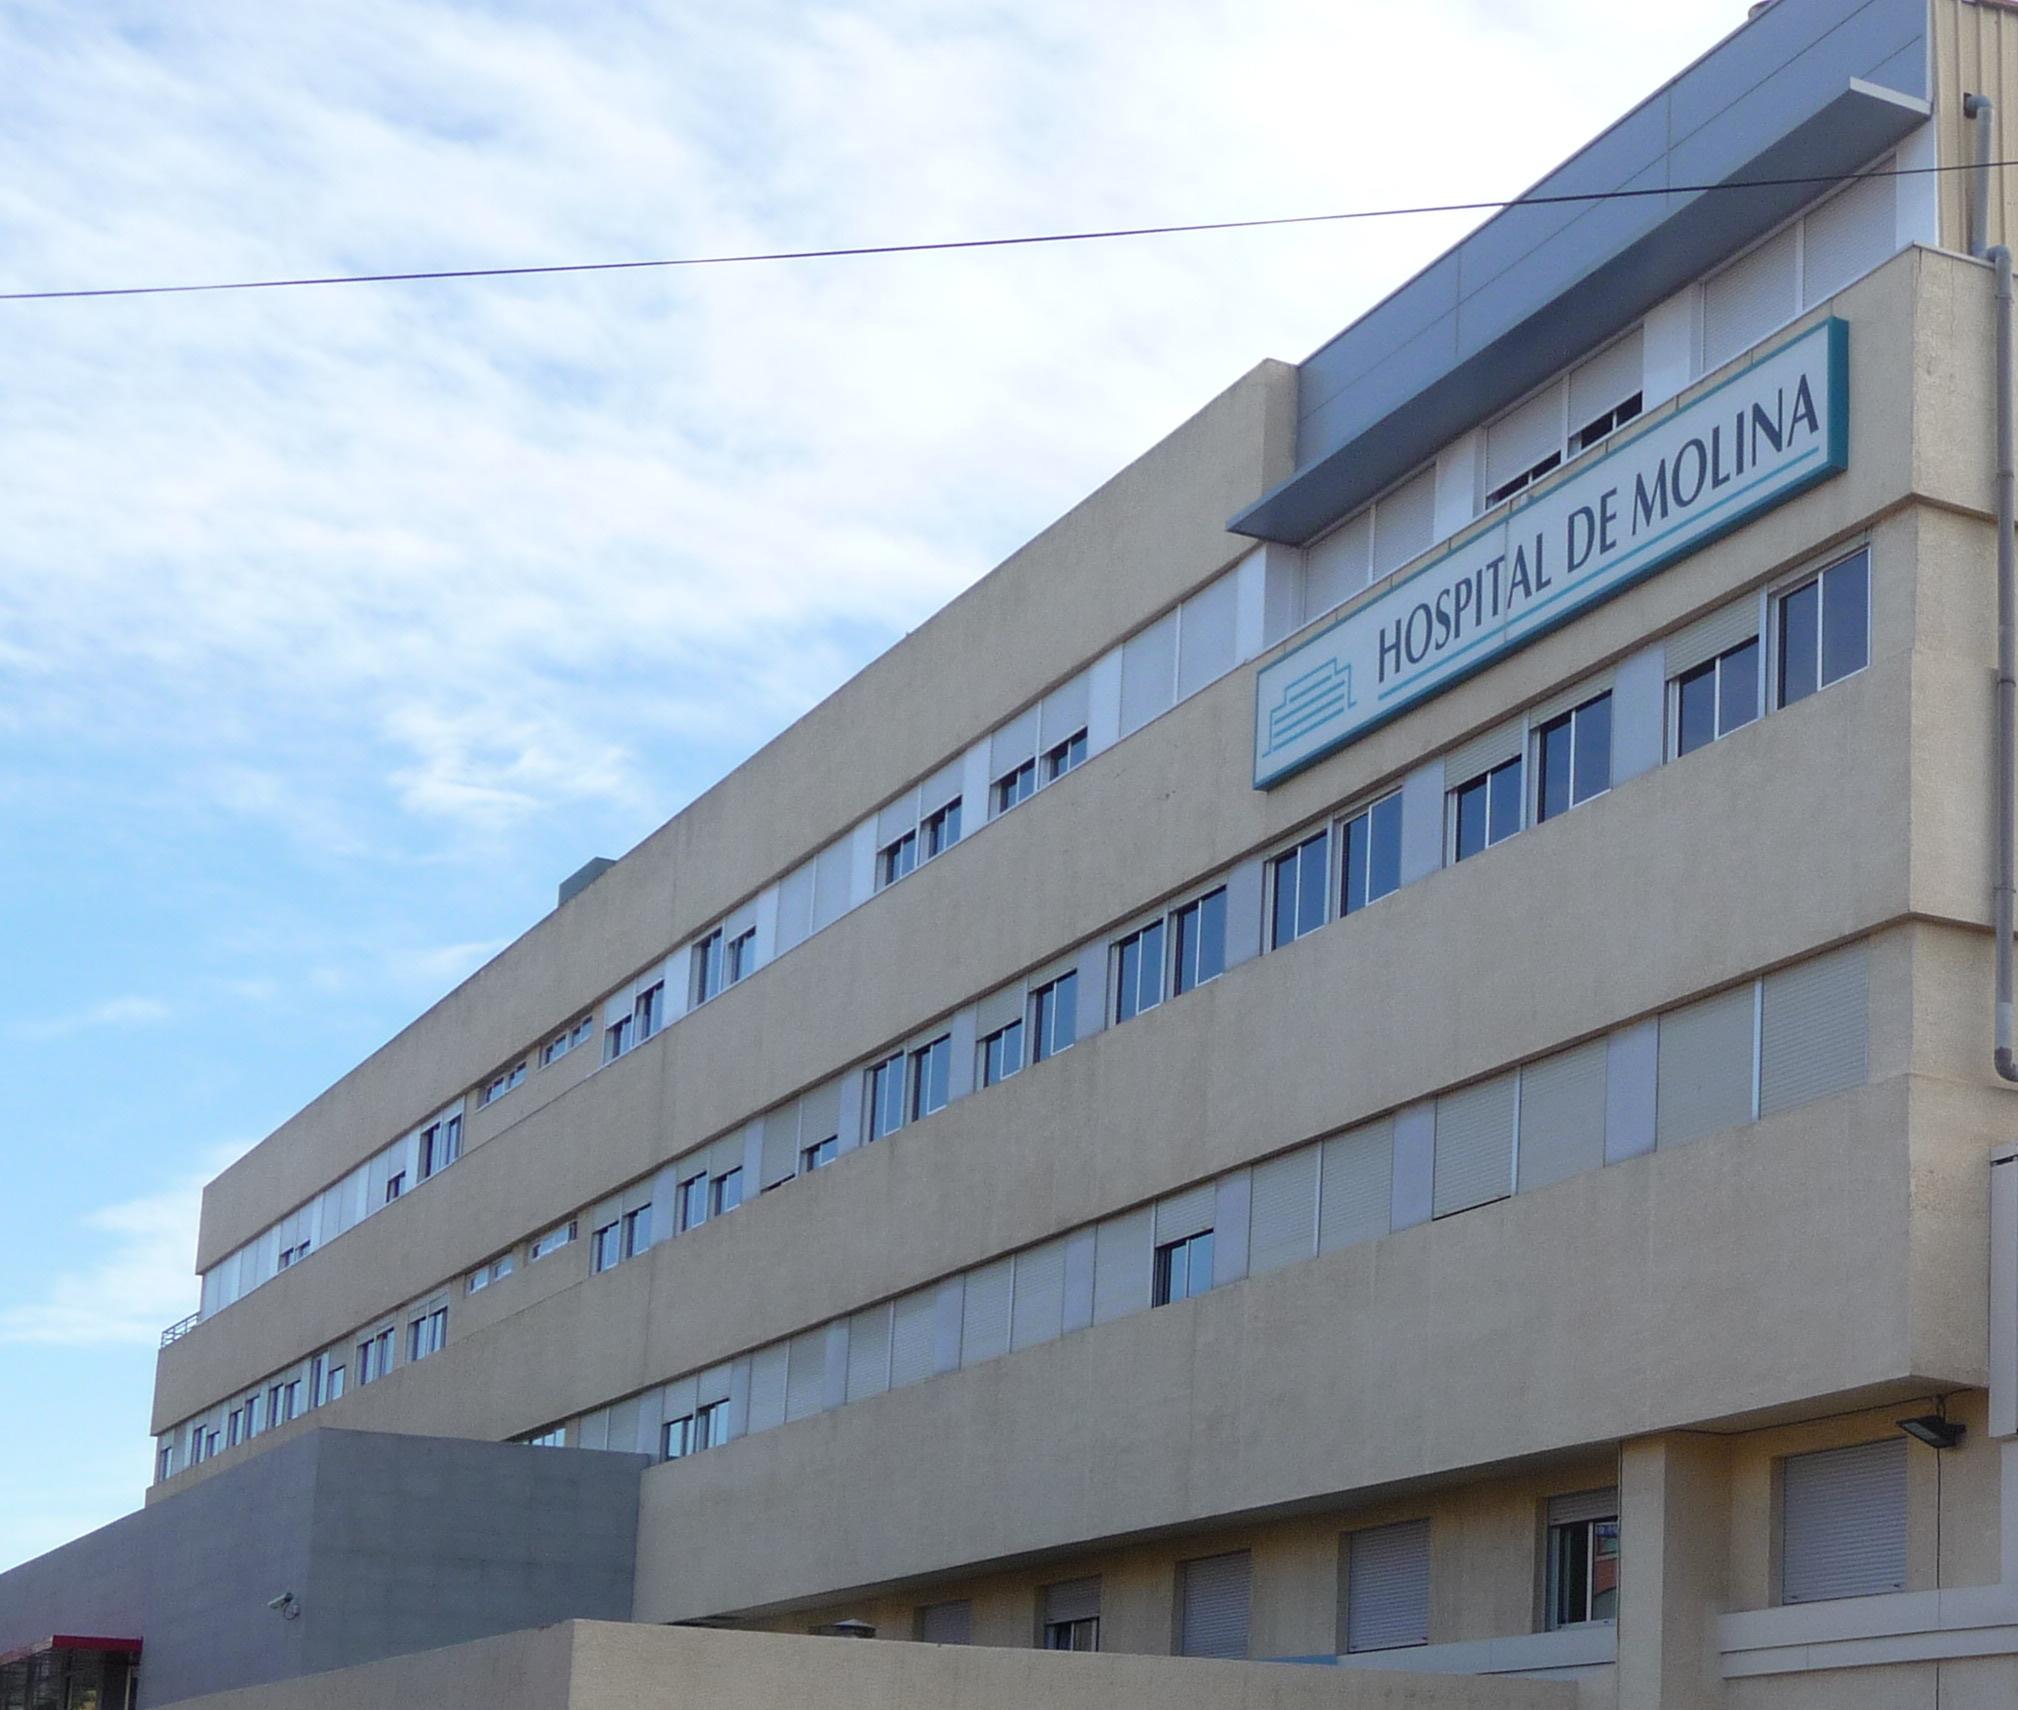 1 Vista de la fachada principal del Hospital de Molina